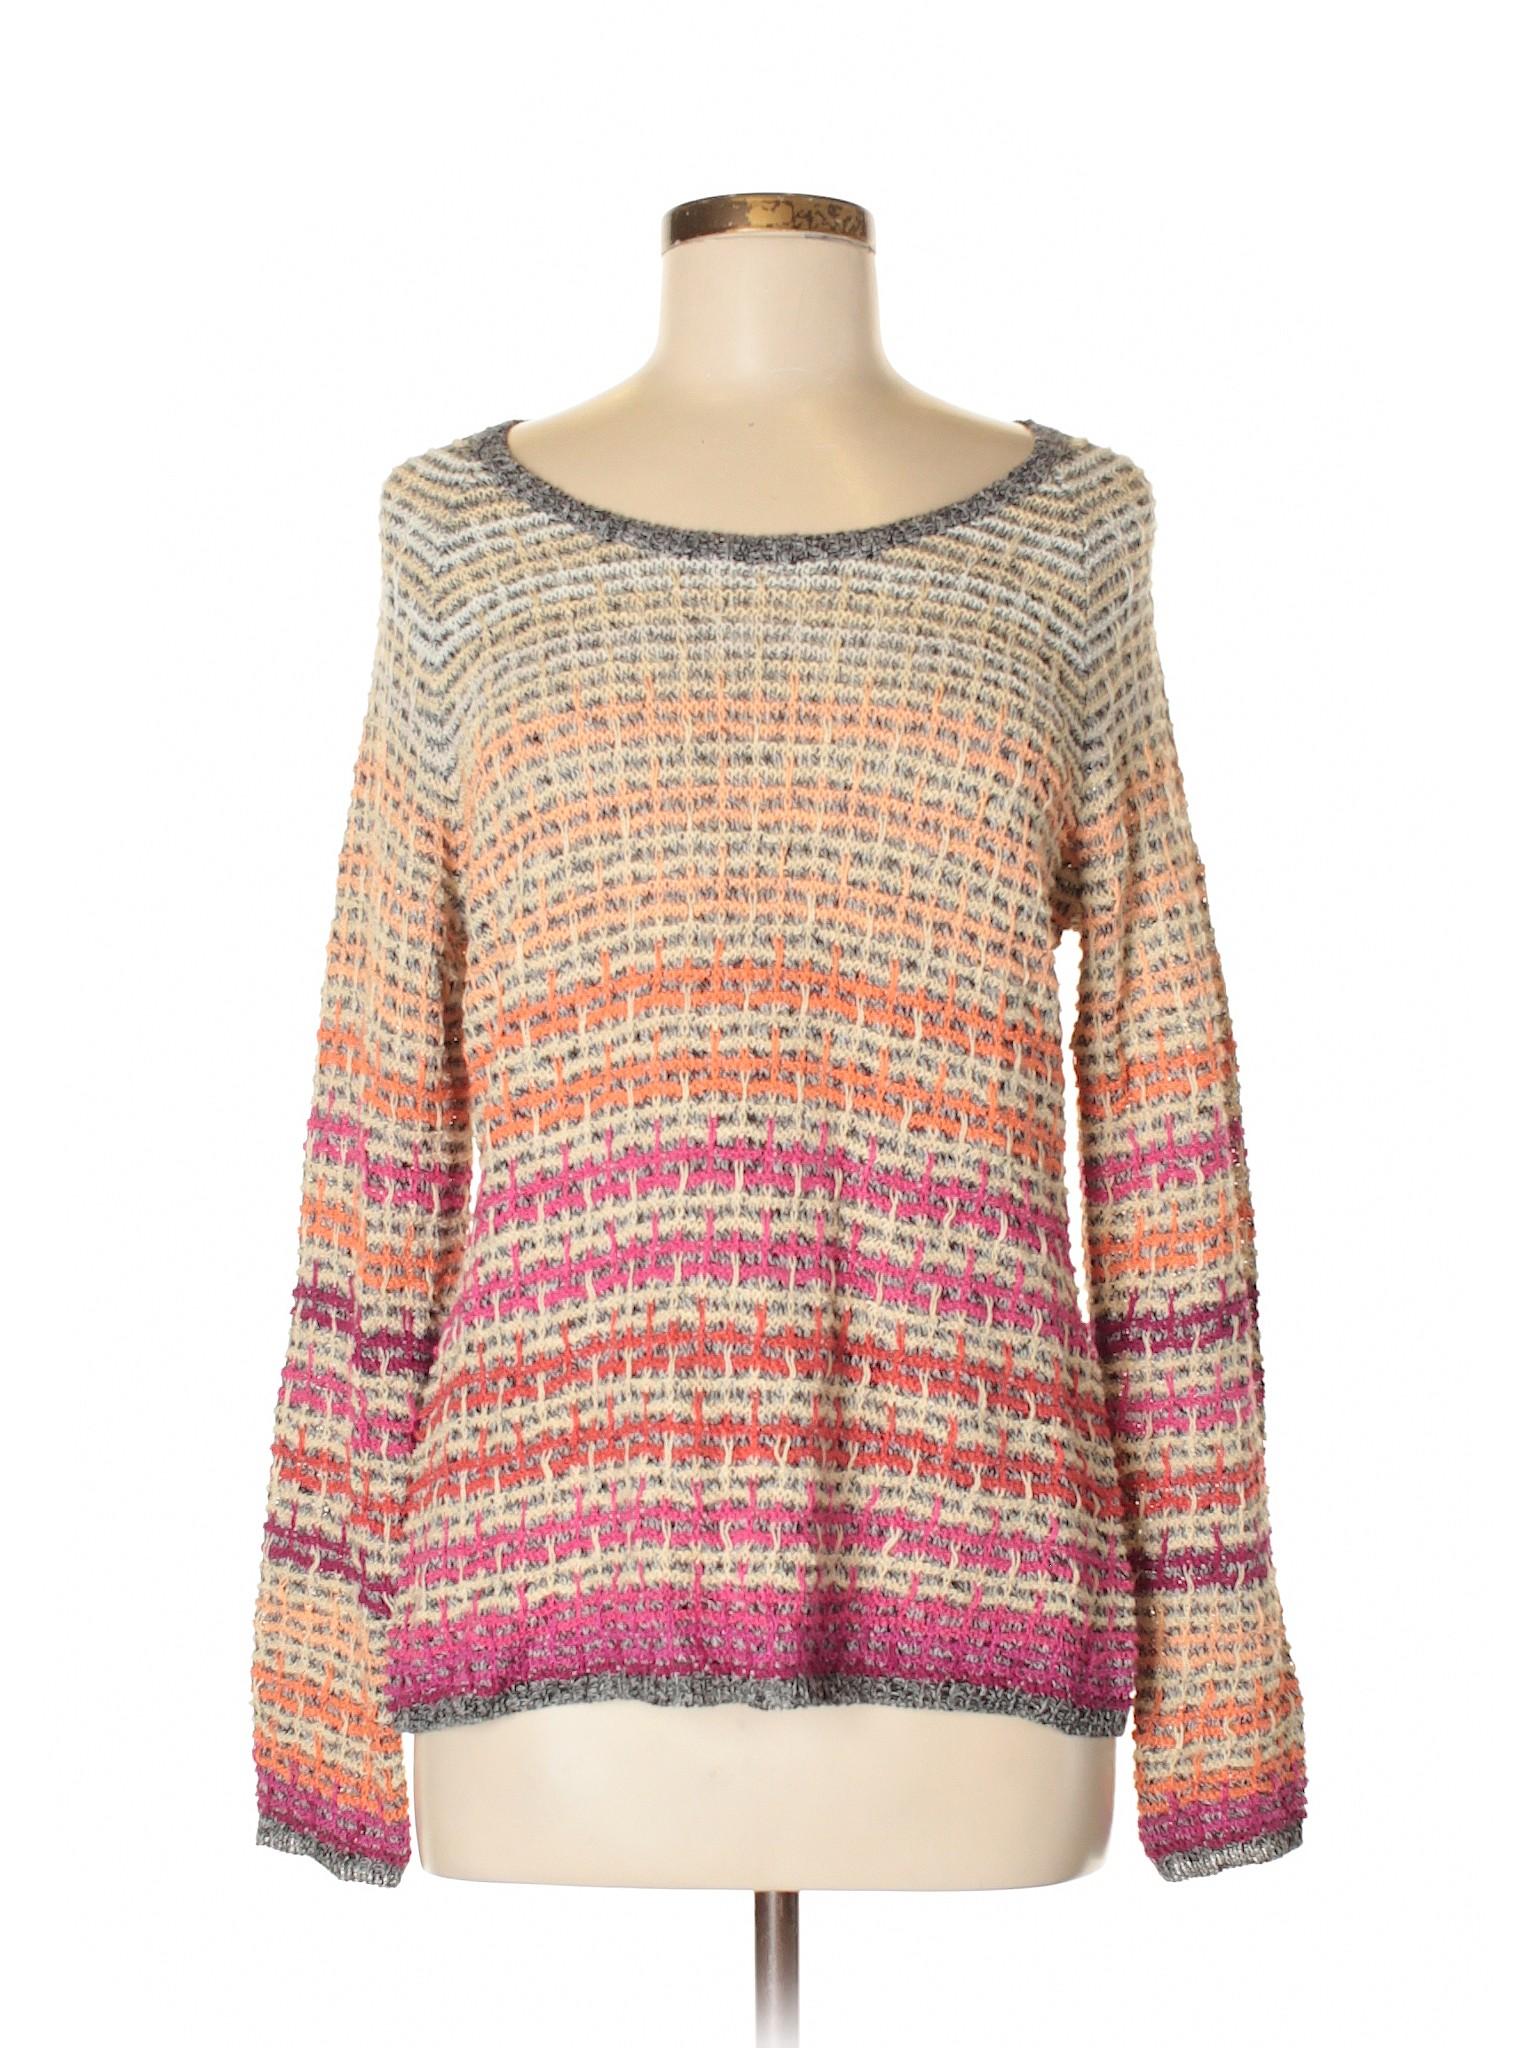 Sweater Boutique Pullover Zoe Nic winter q66wUvSIx